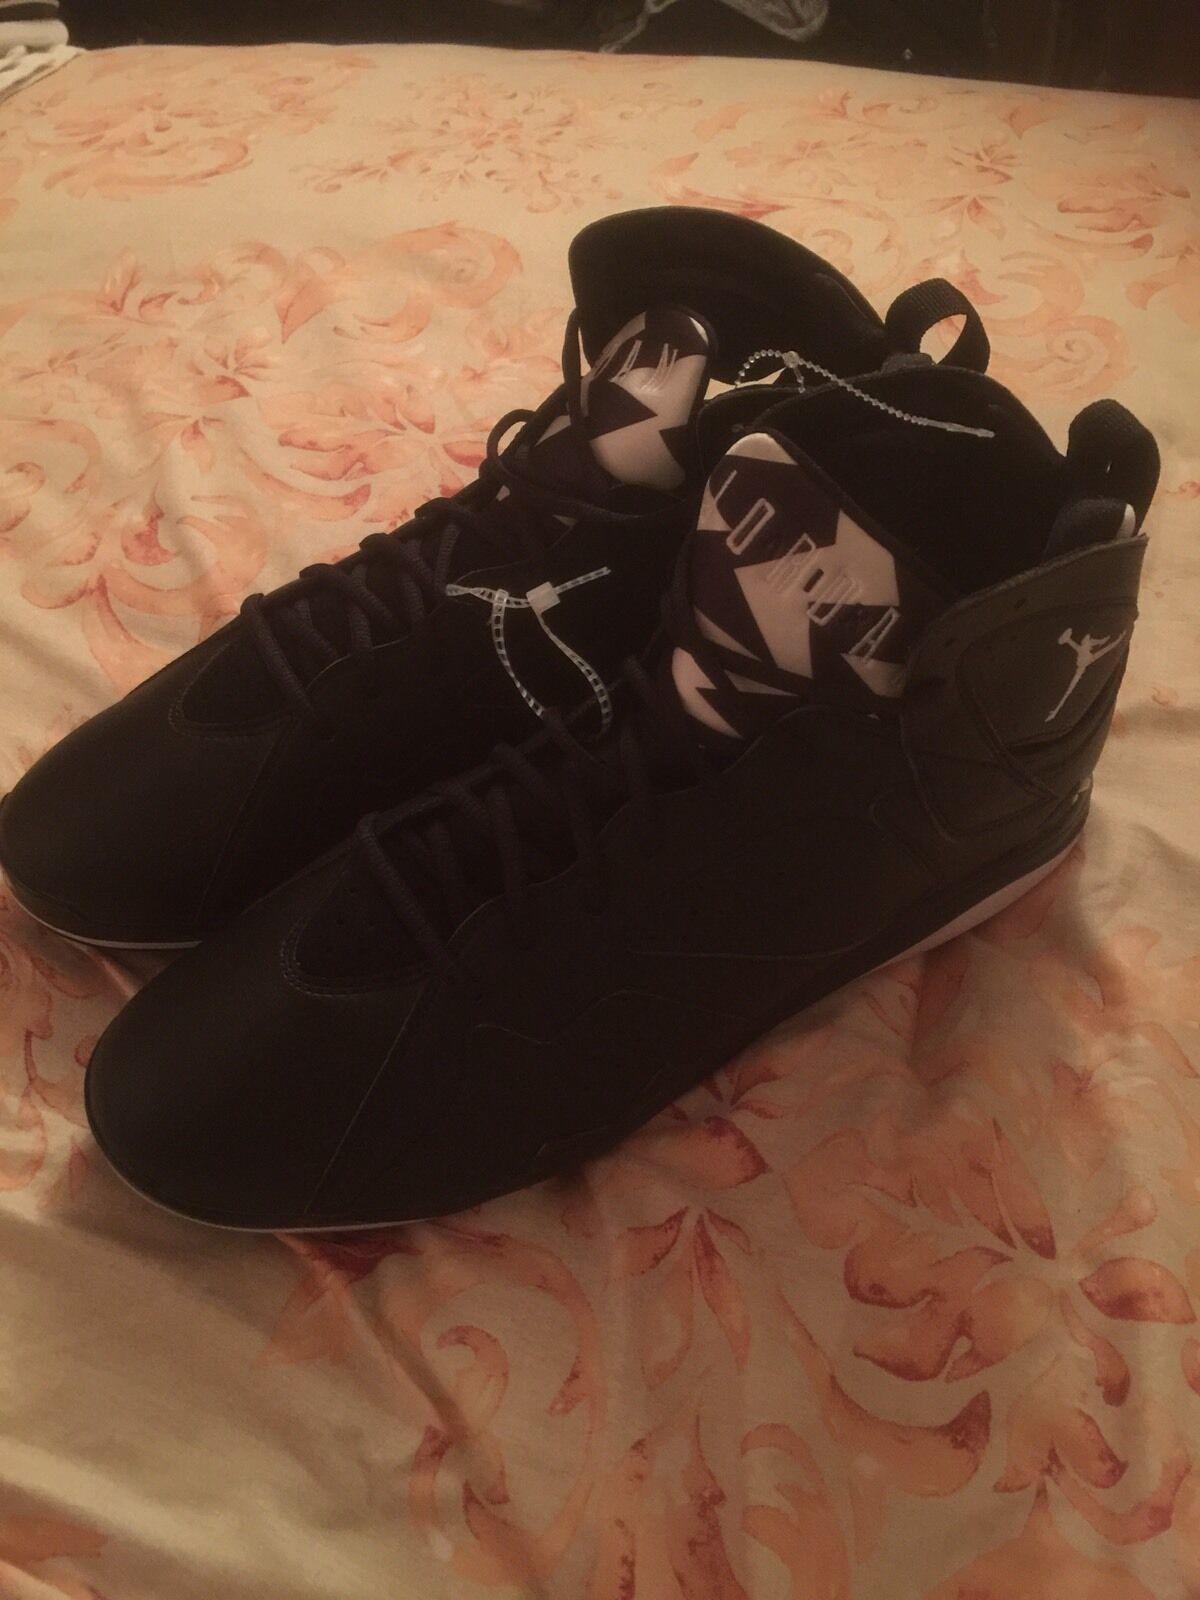 Nike air jordan 7 retrò mcs baseball 16 metà scarpe da baseball mcs 684942 010 nero 8f7a2c